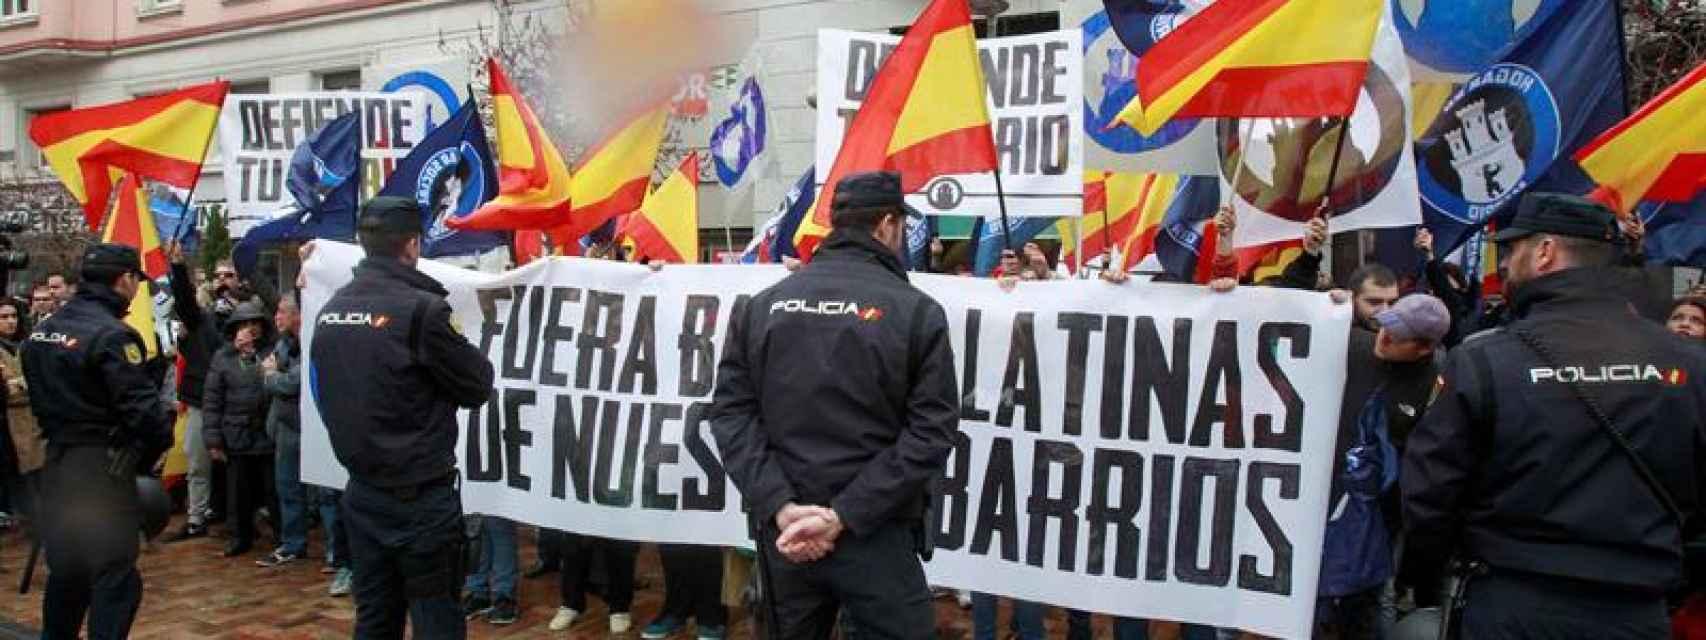 facebook login español españa tetuán de las victorias